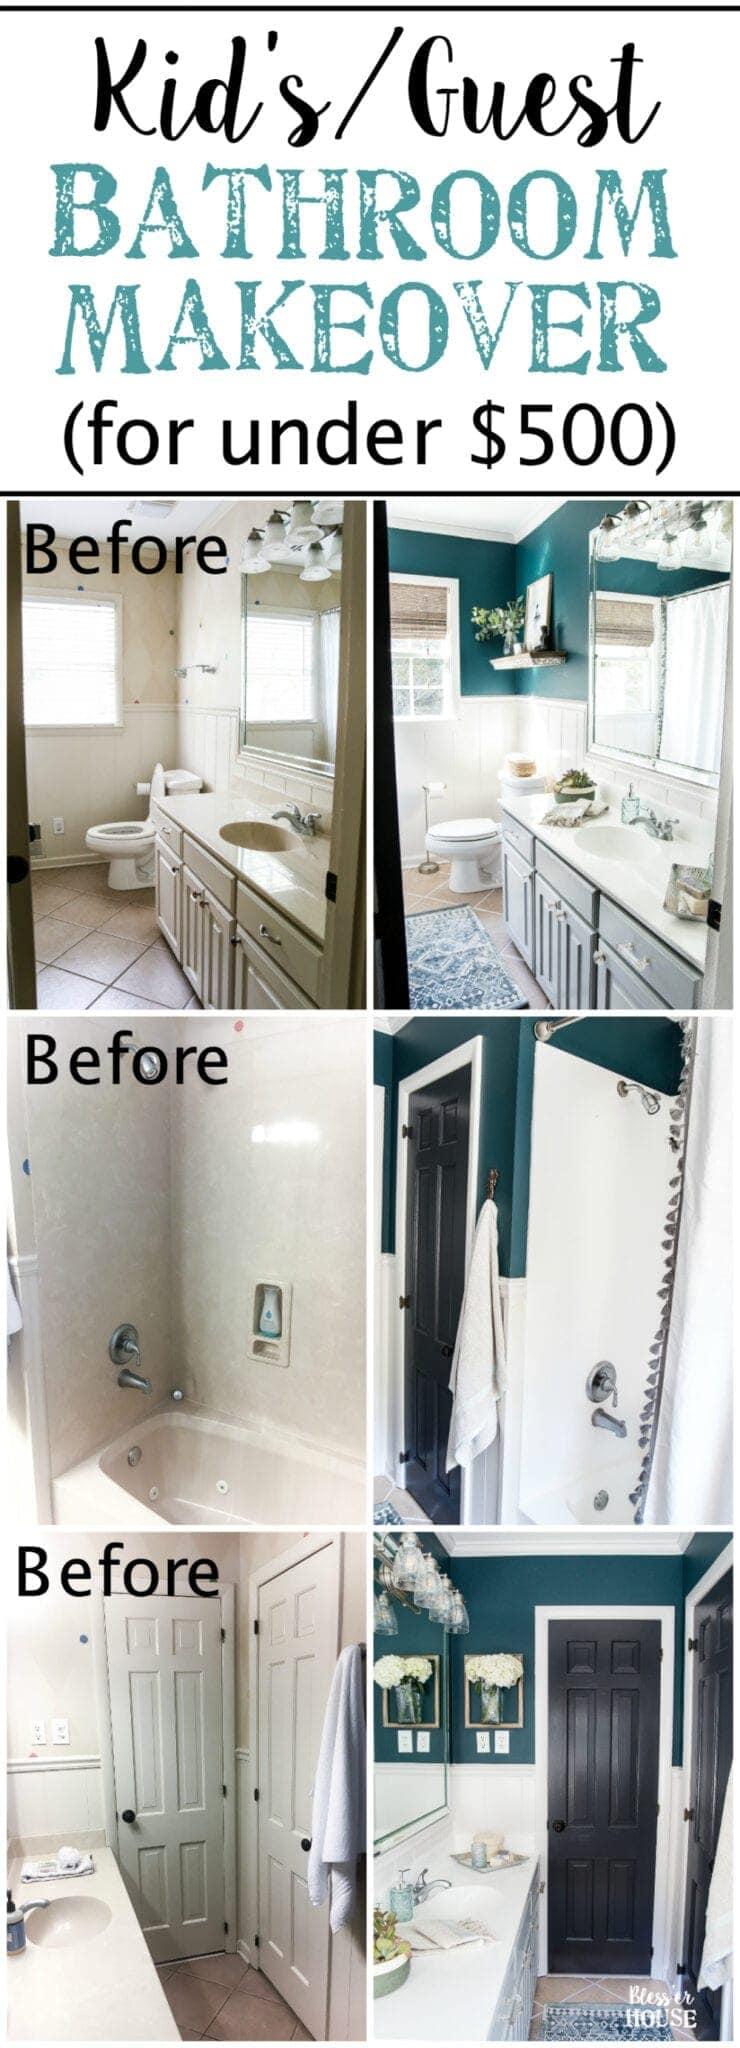 Kids Guest Bathroom Makeover Reveal Blesser House